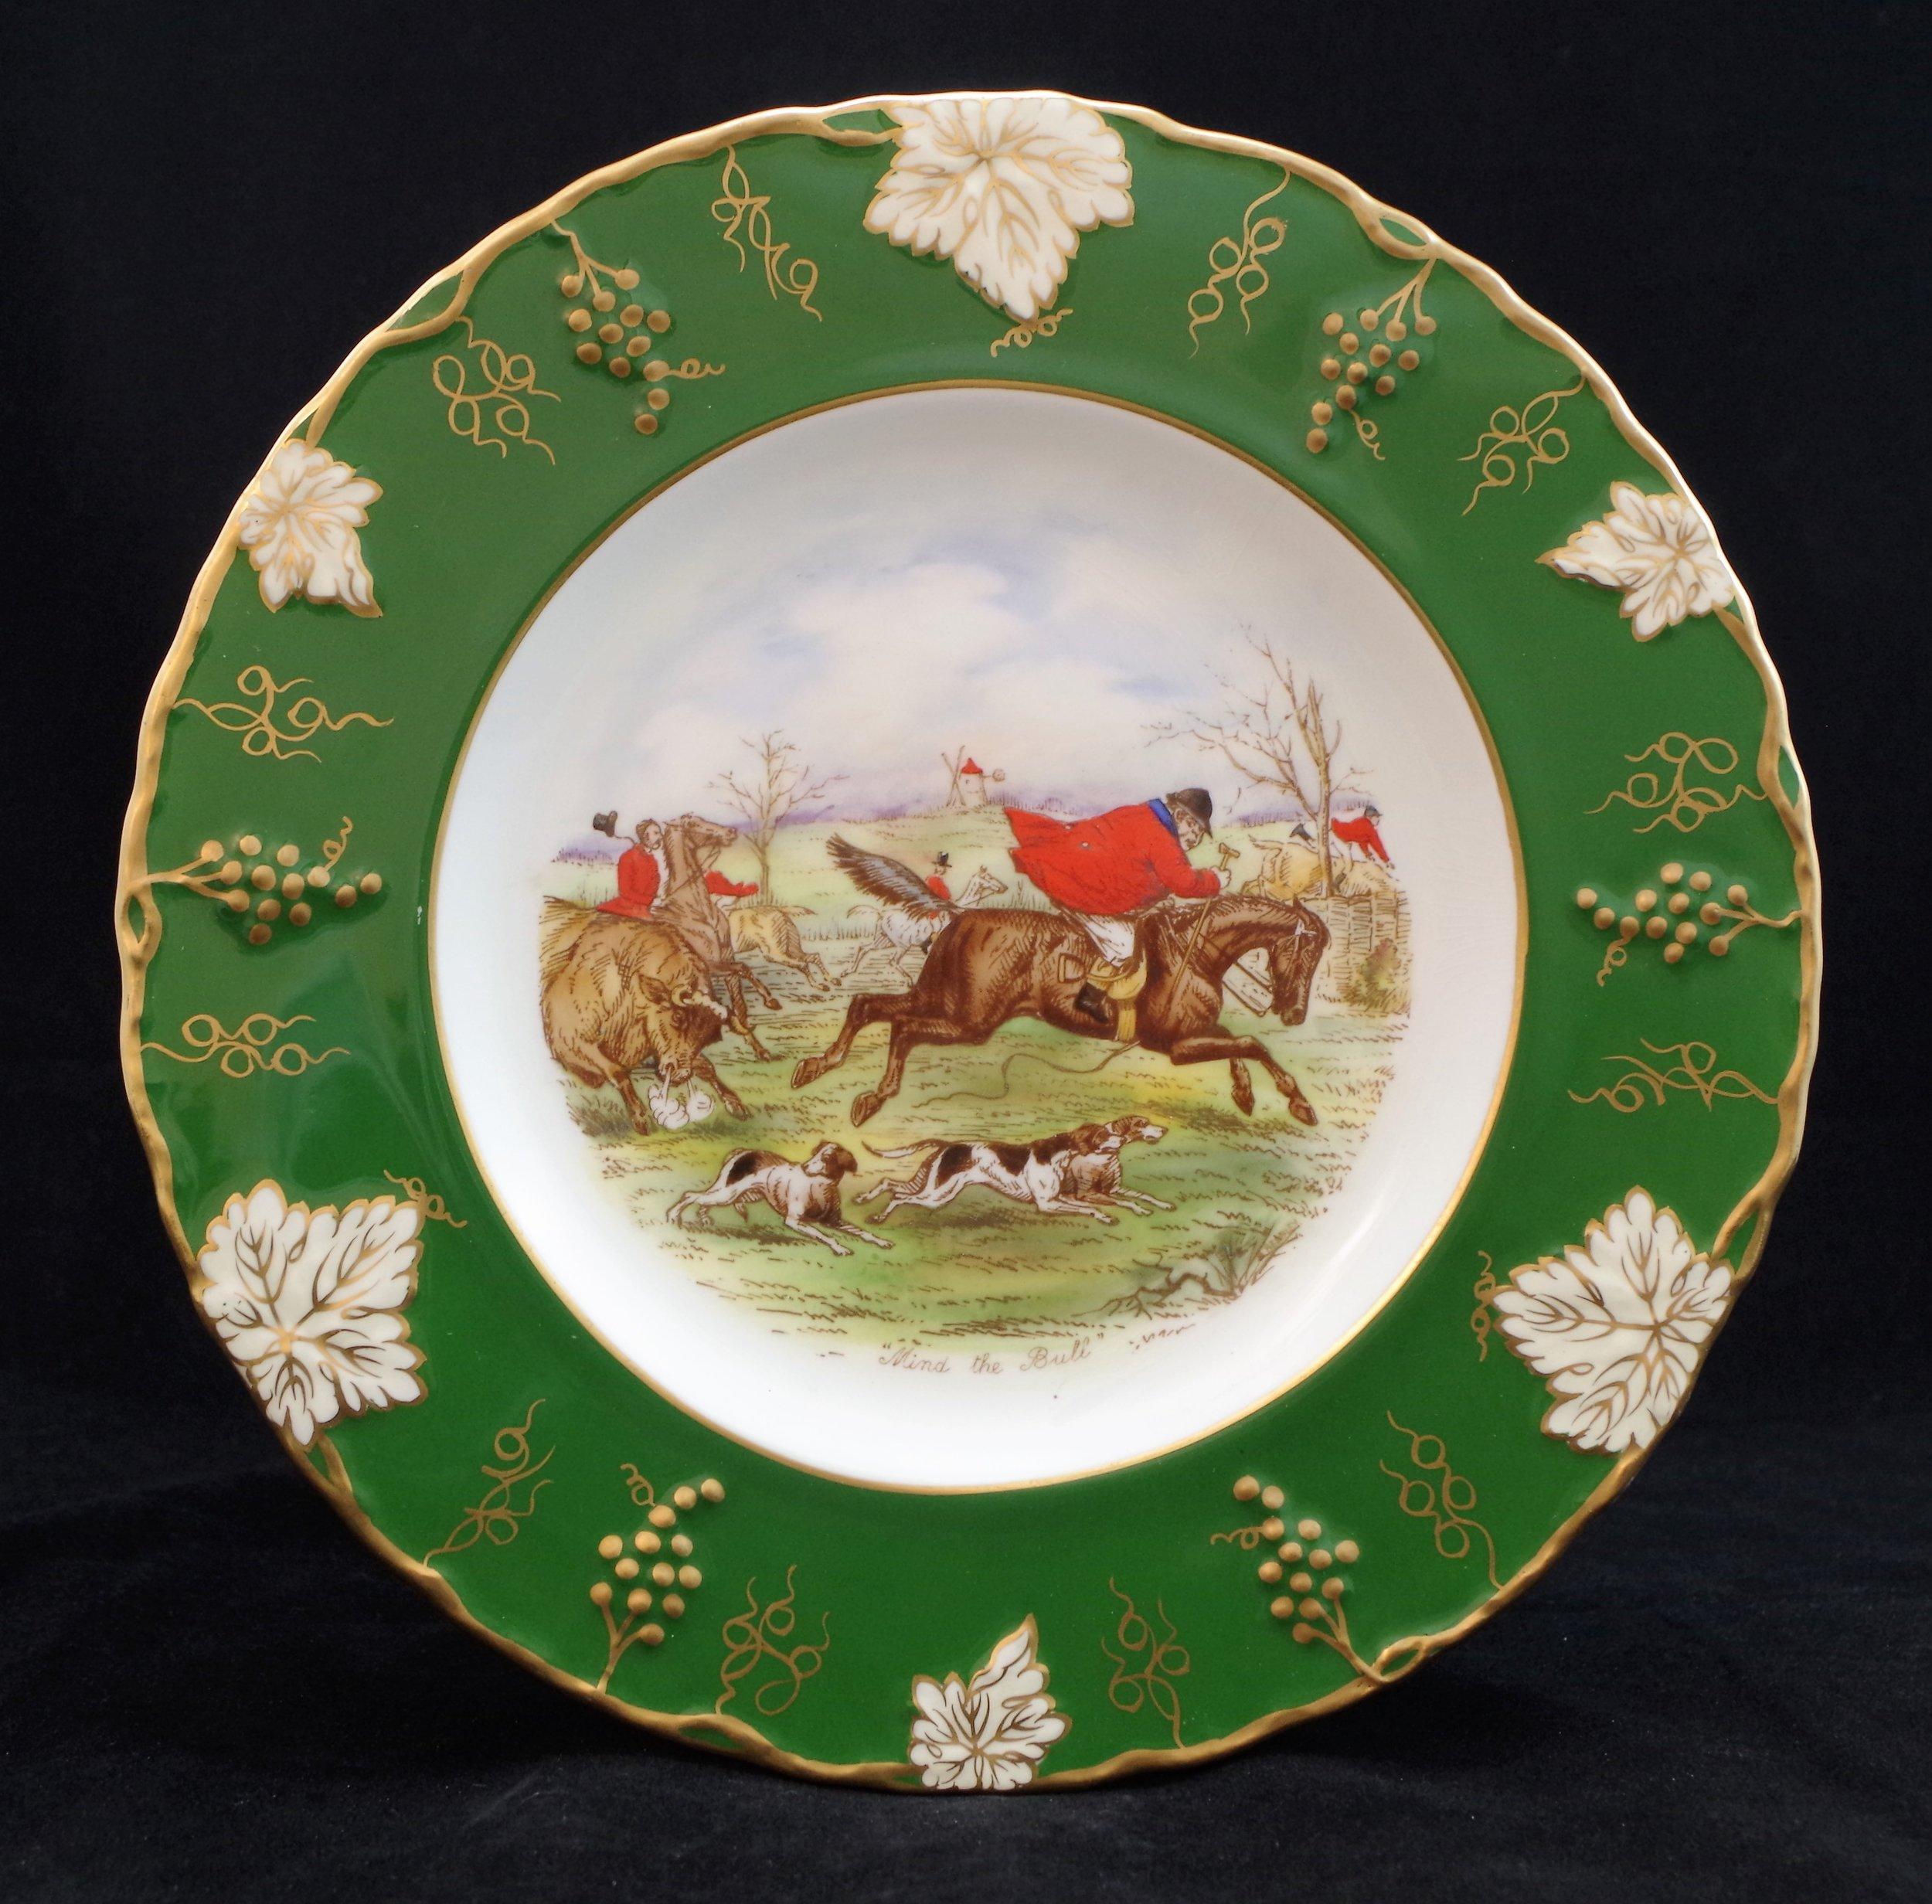 royal-crown-derby-vine-siam-green-ground-jorrocks-1